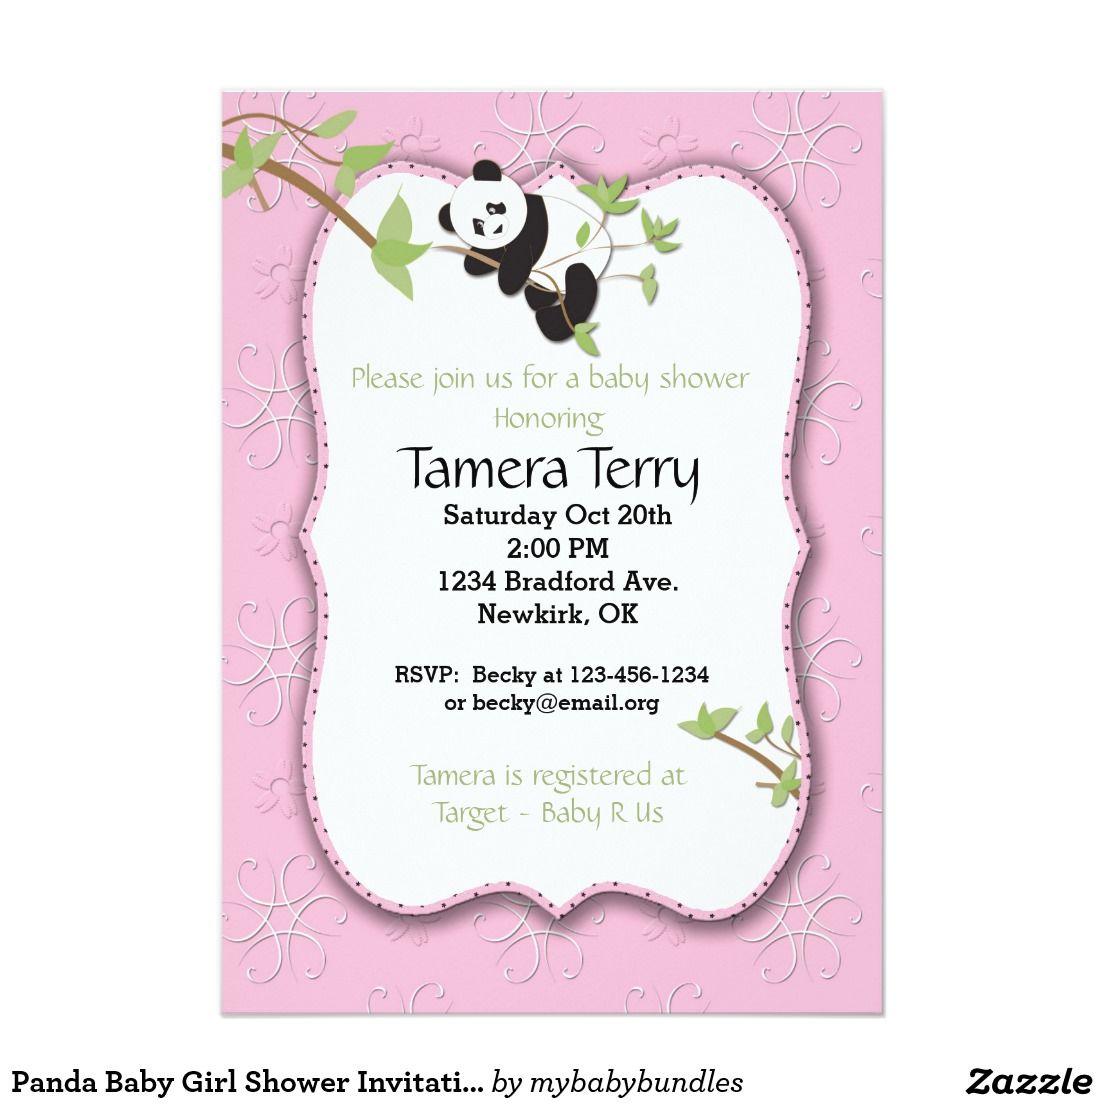 Panda Baby Girl Shower Invitation   babyshower panda   Pinterest ...